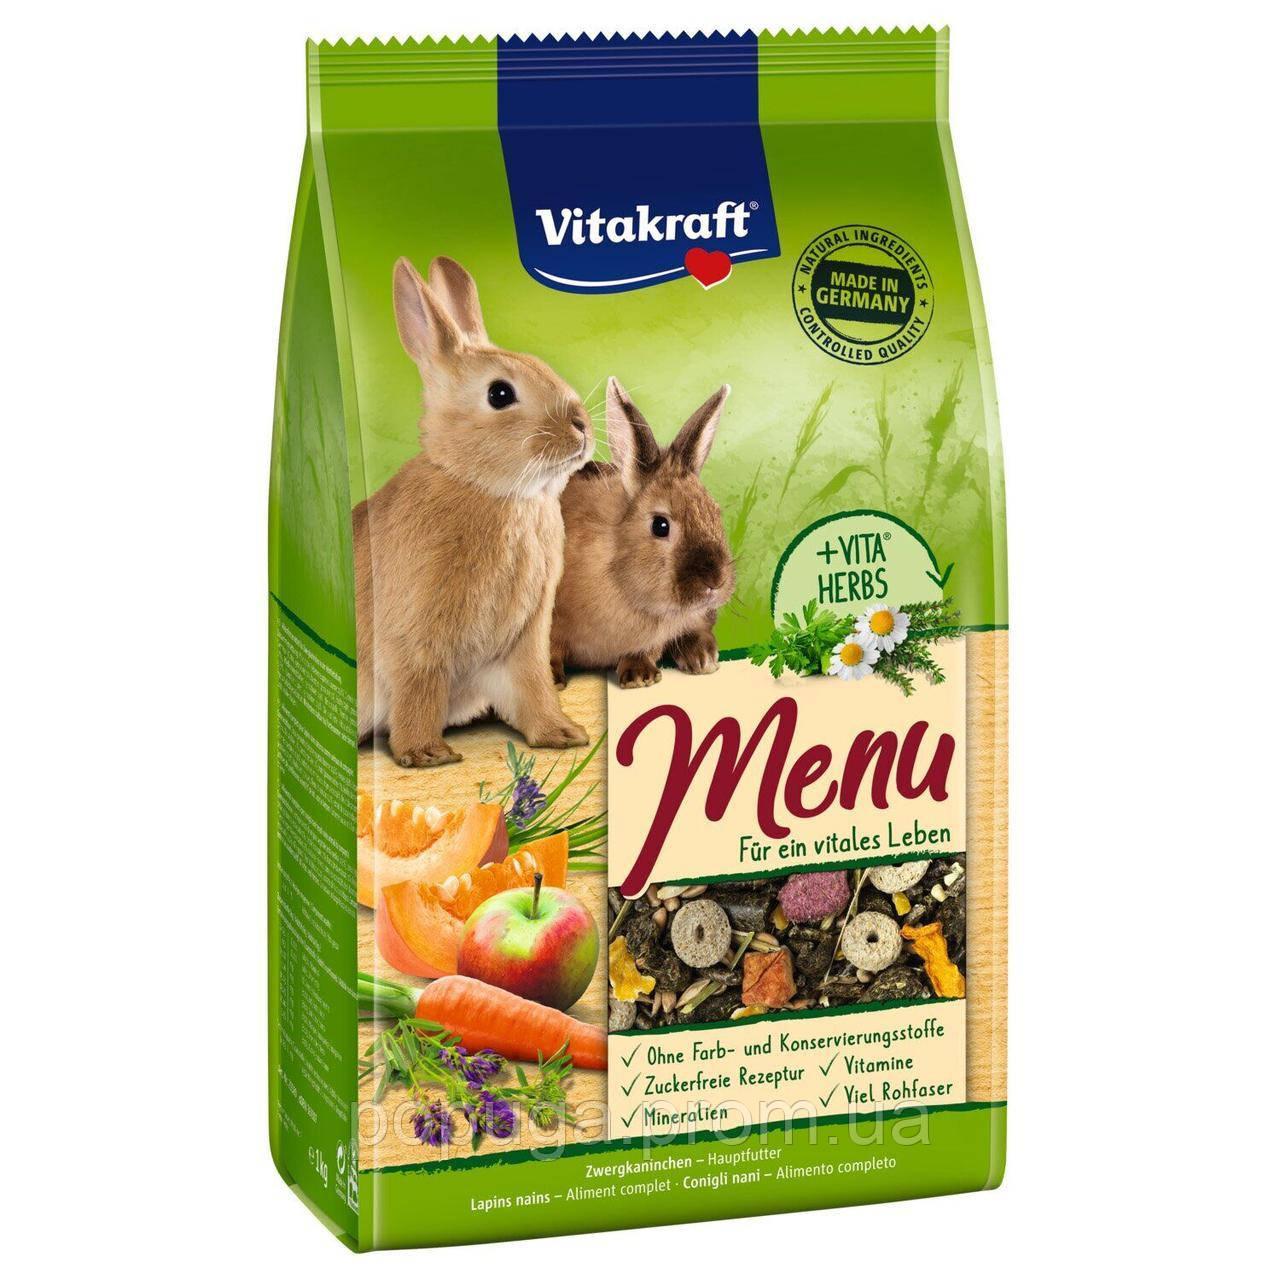 Vitakraft Menu Vital для кроликів, 5 кг